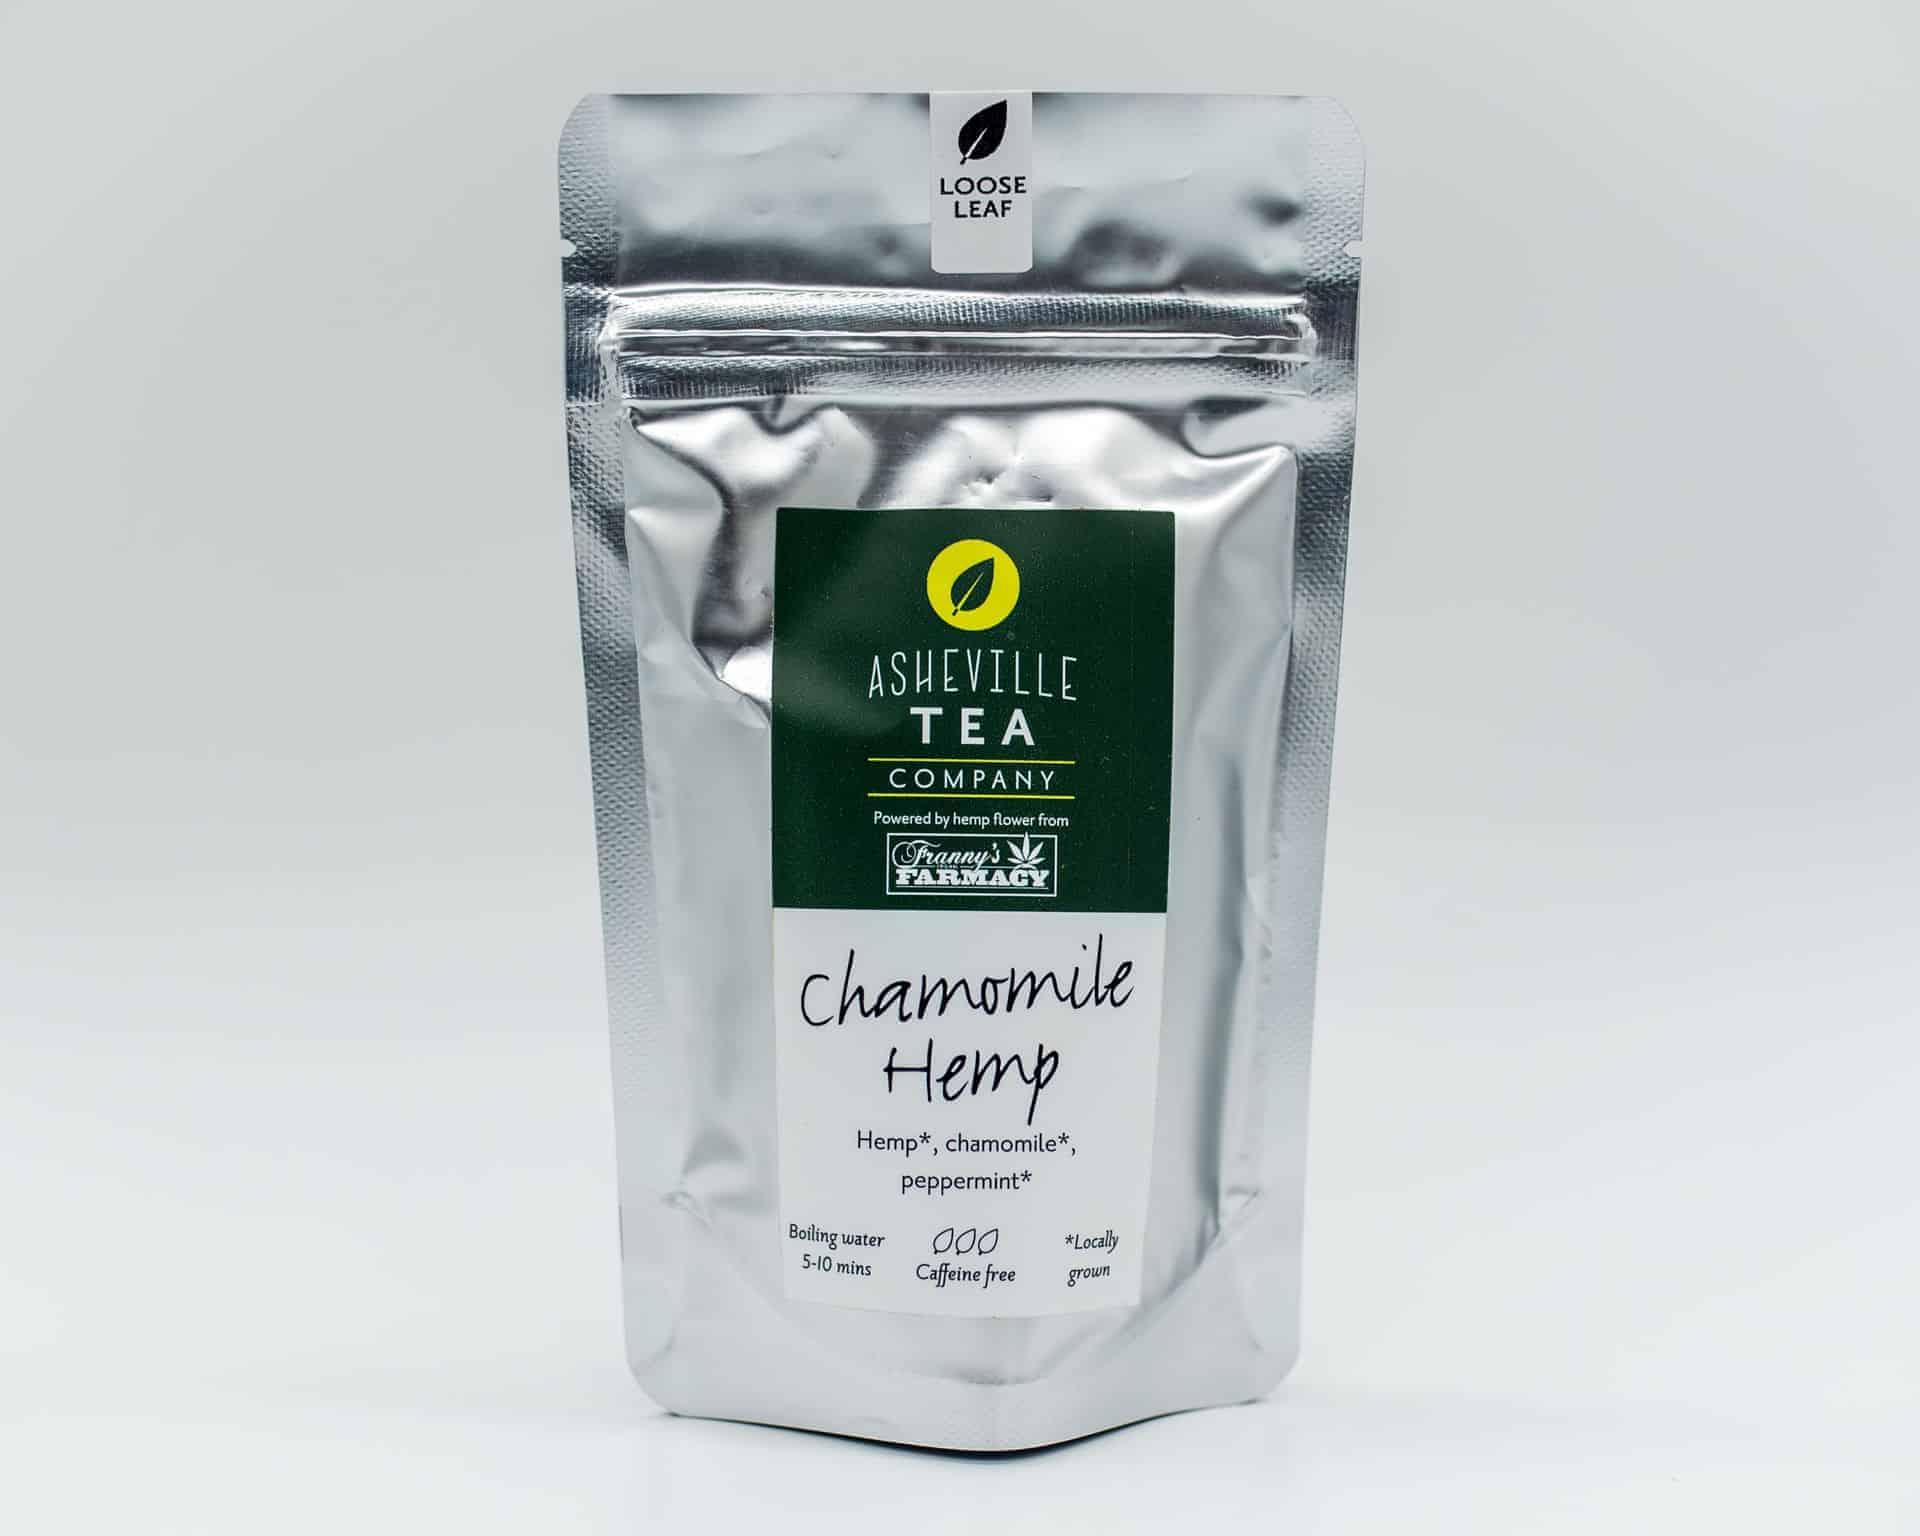 Asheville Tea Company Chamomile Hemp Flavor